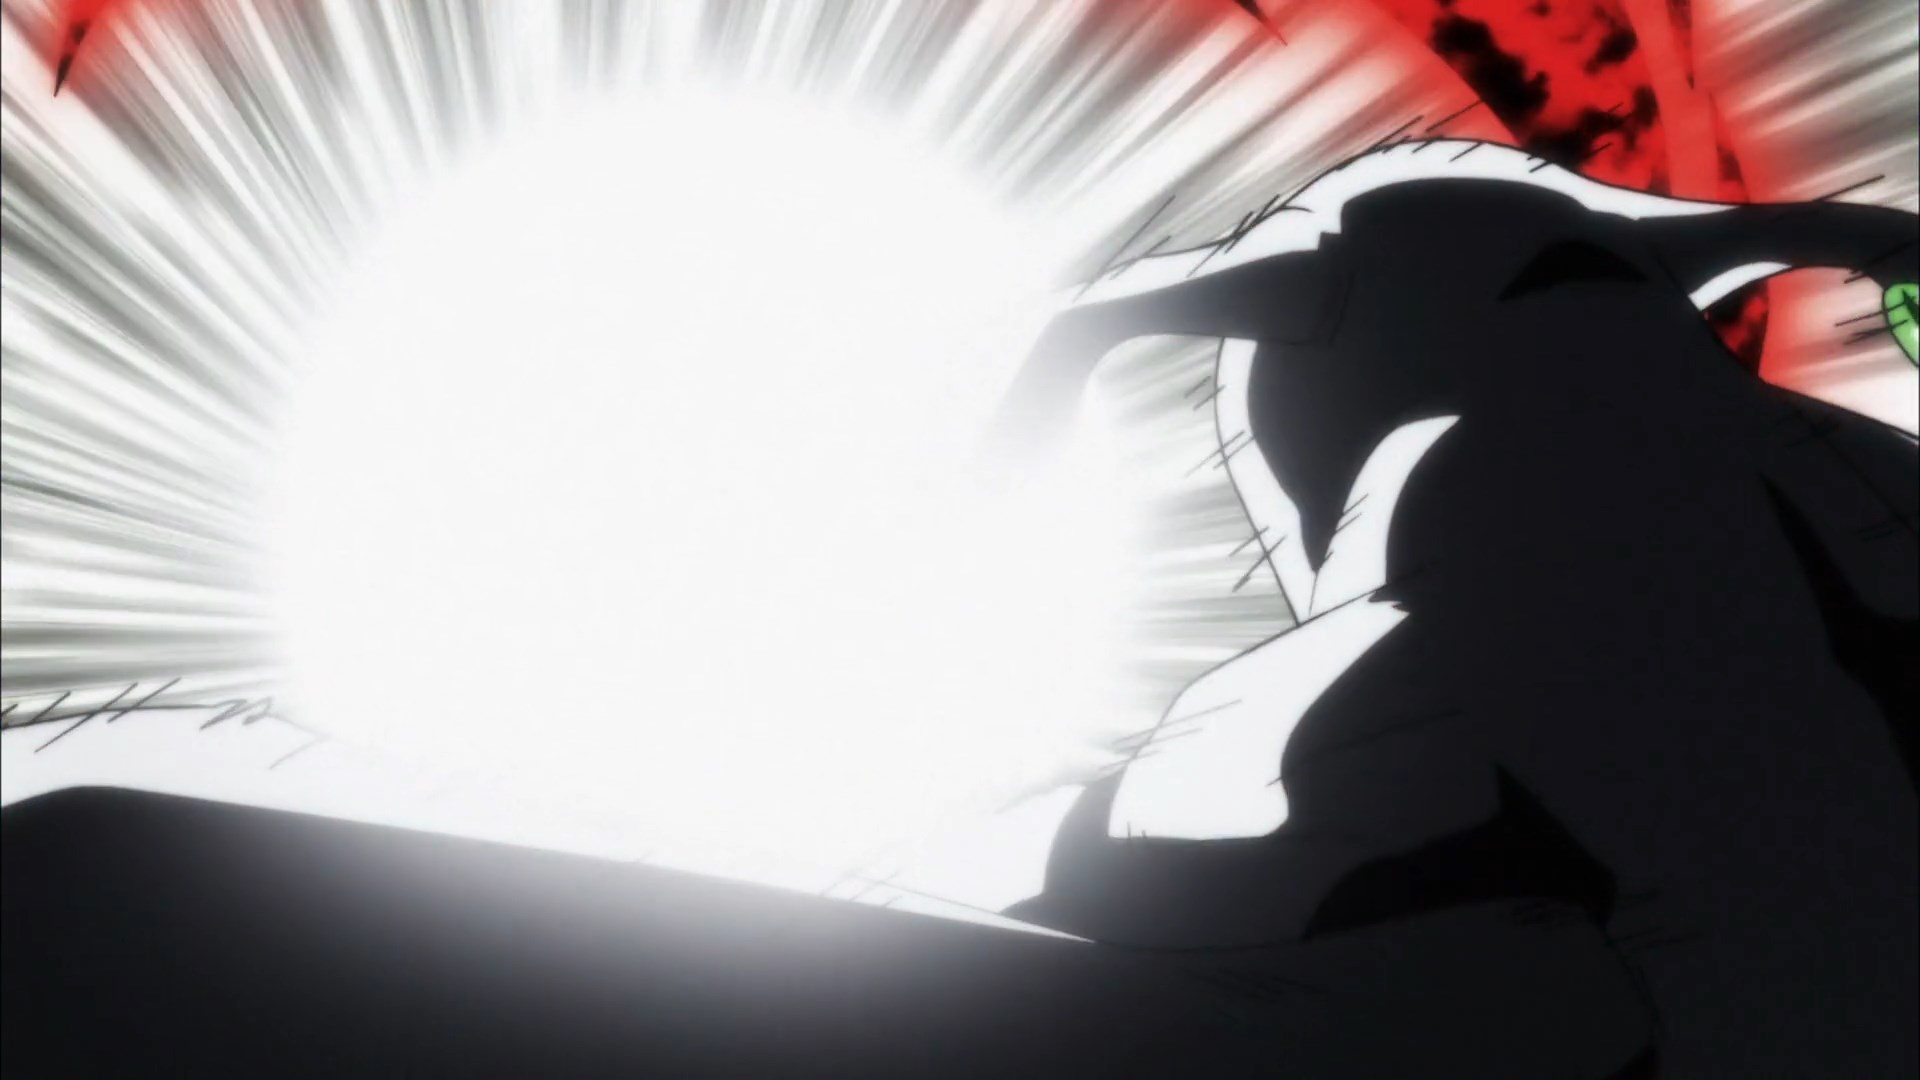 [HorribleSubs] Dragon Ball Super - 121 [1080p].mkv_snapshot_19.32